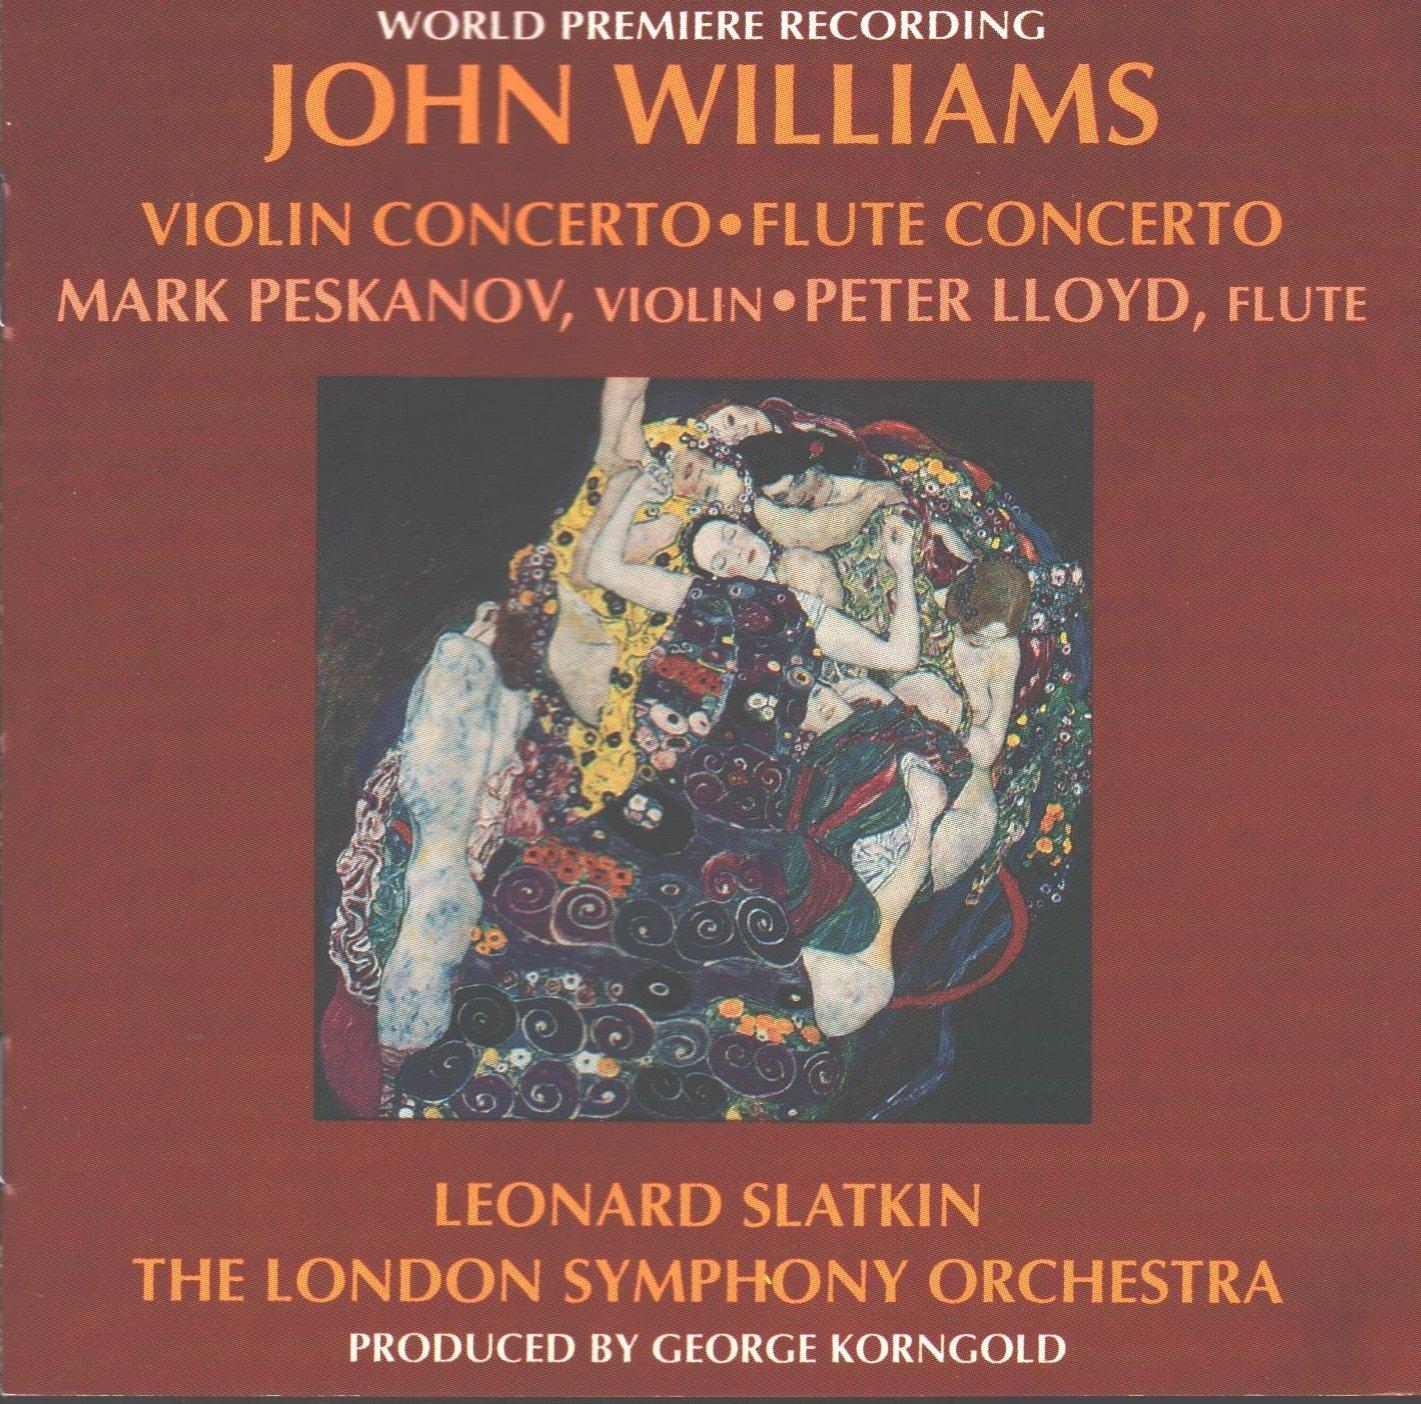 John Williams, Mark Peskanov, Peter Lloyd, Leonard Slatkin, The London  Symphony Orchestra - Violin Concerto / Flute Concerto - Amazon.com Music